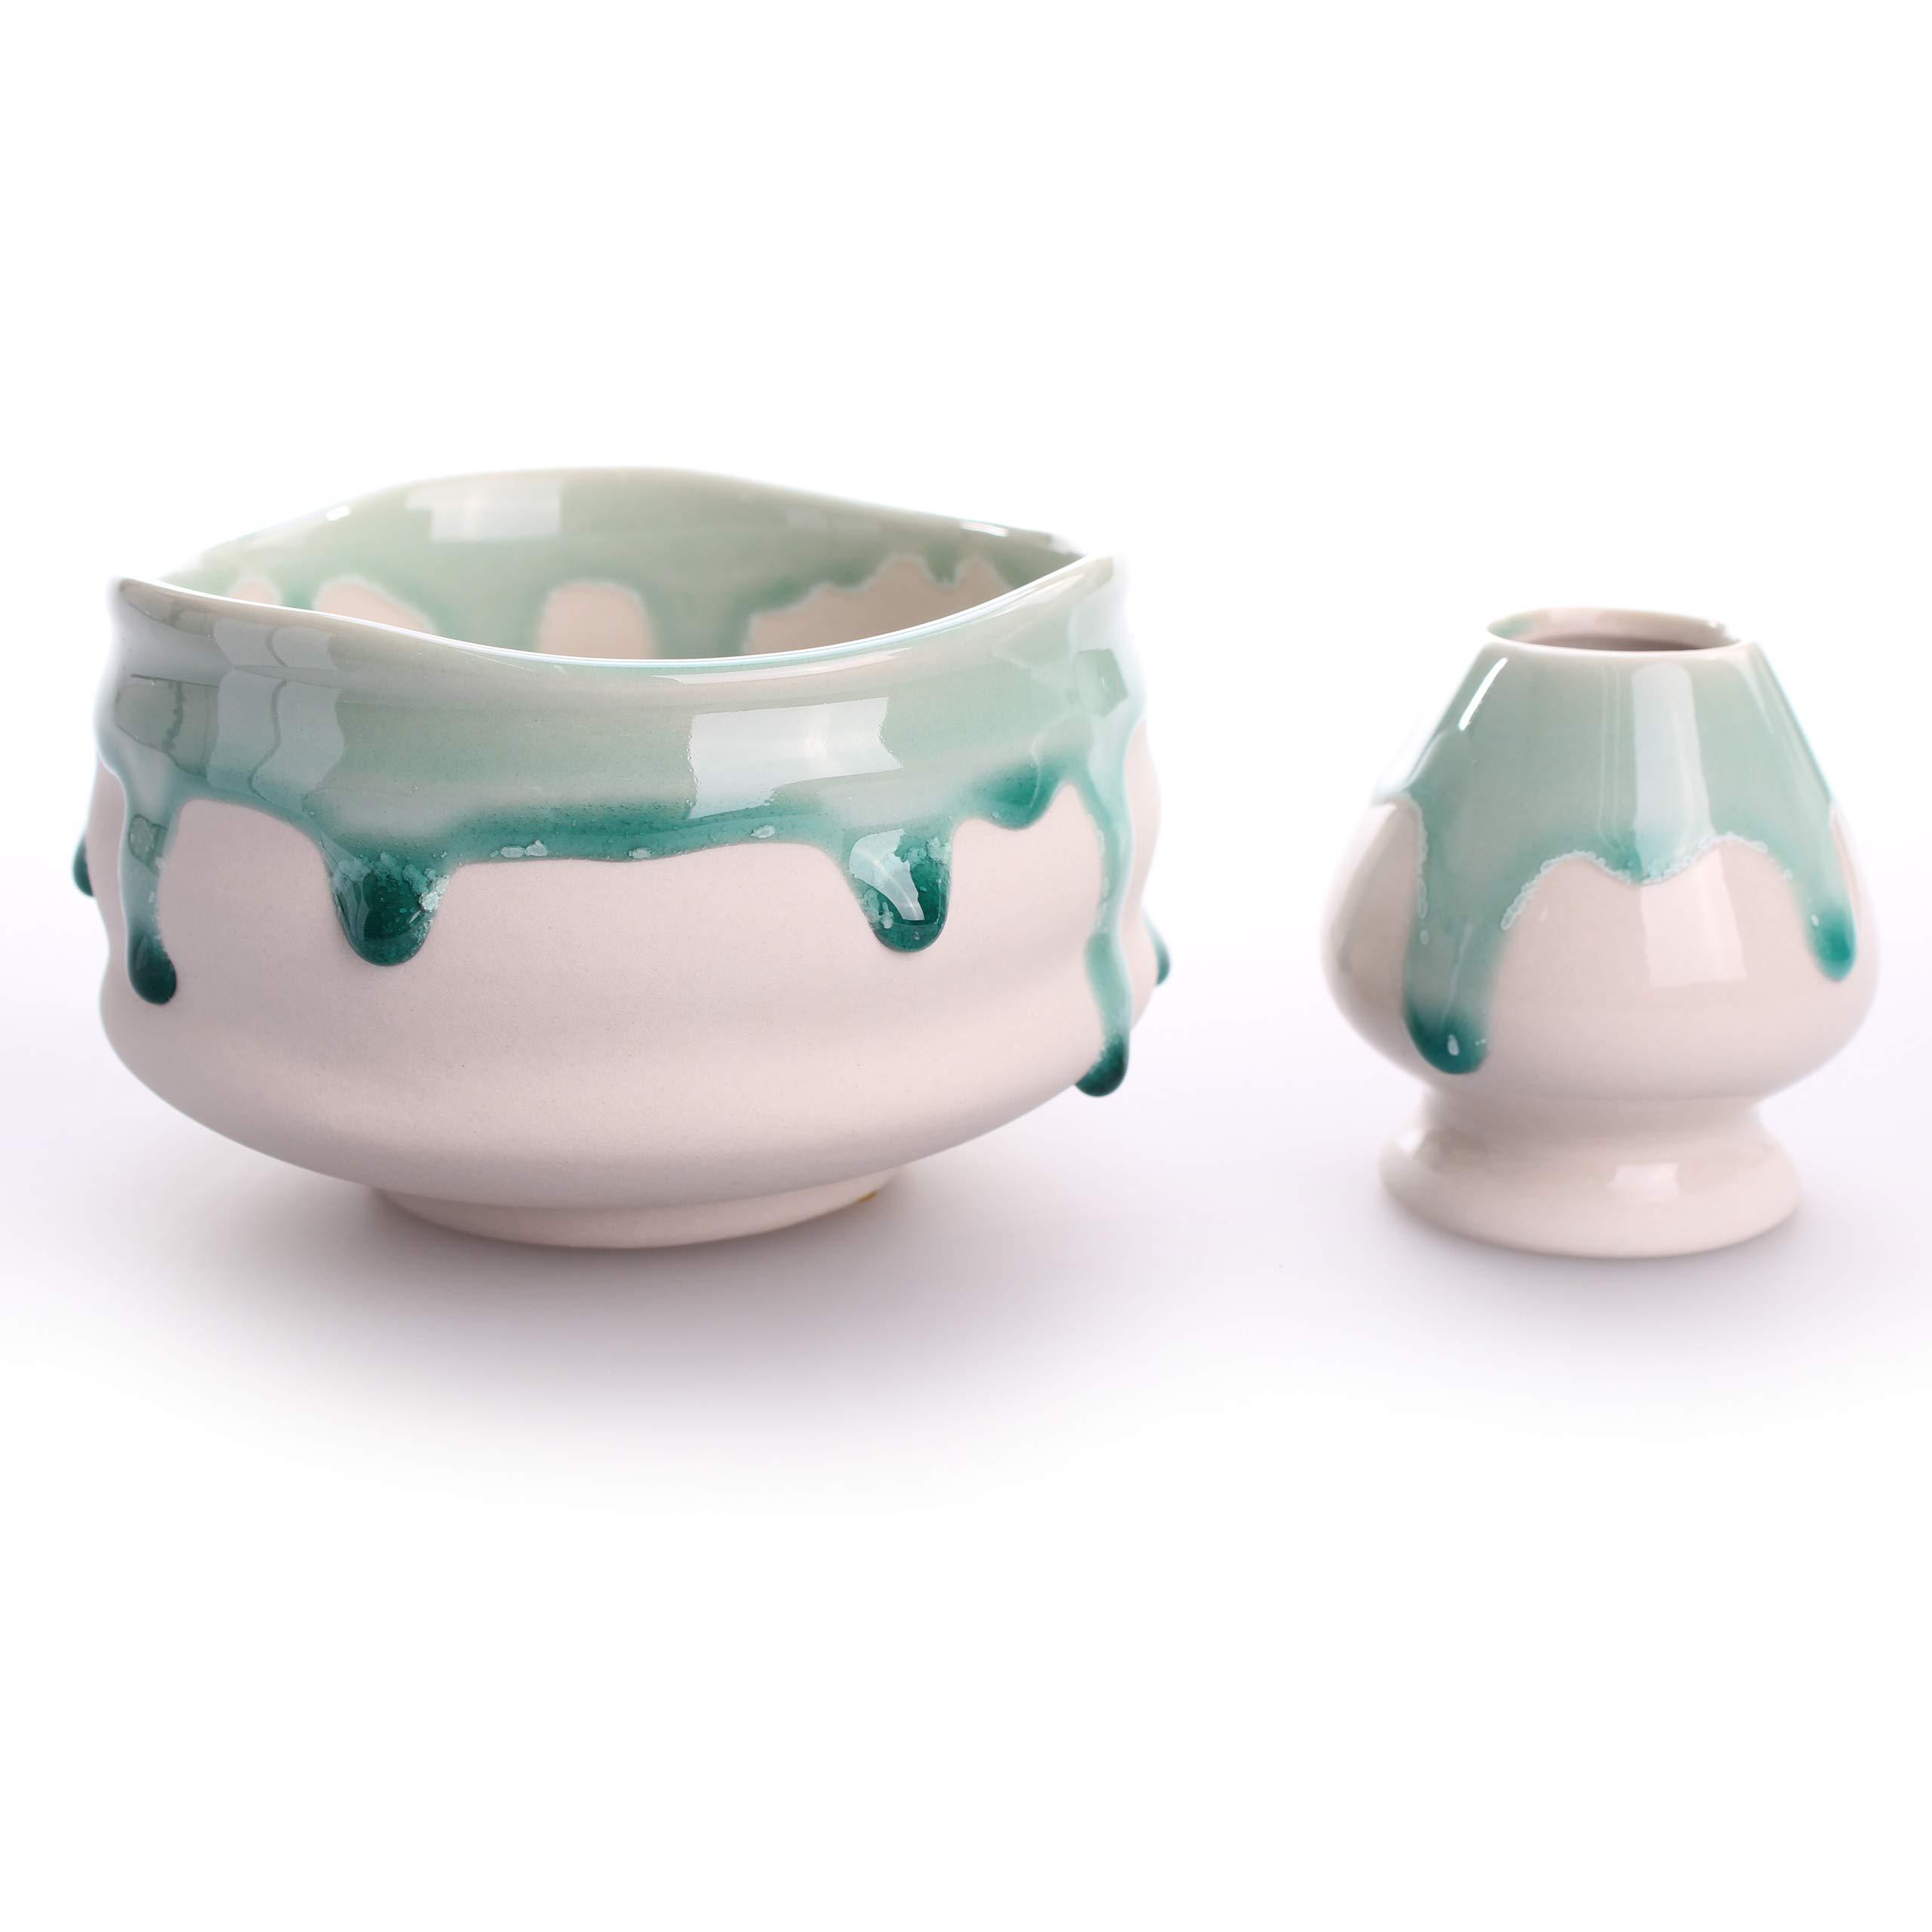 Goodwei Japanese Matcha Ceremonial Tea Bowl 15oz, 4.7 in. (incl. Whisk Holder, Suiteki)